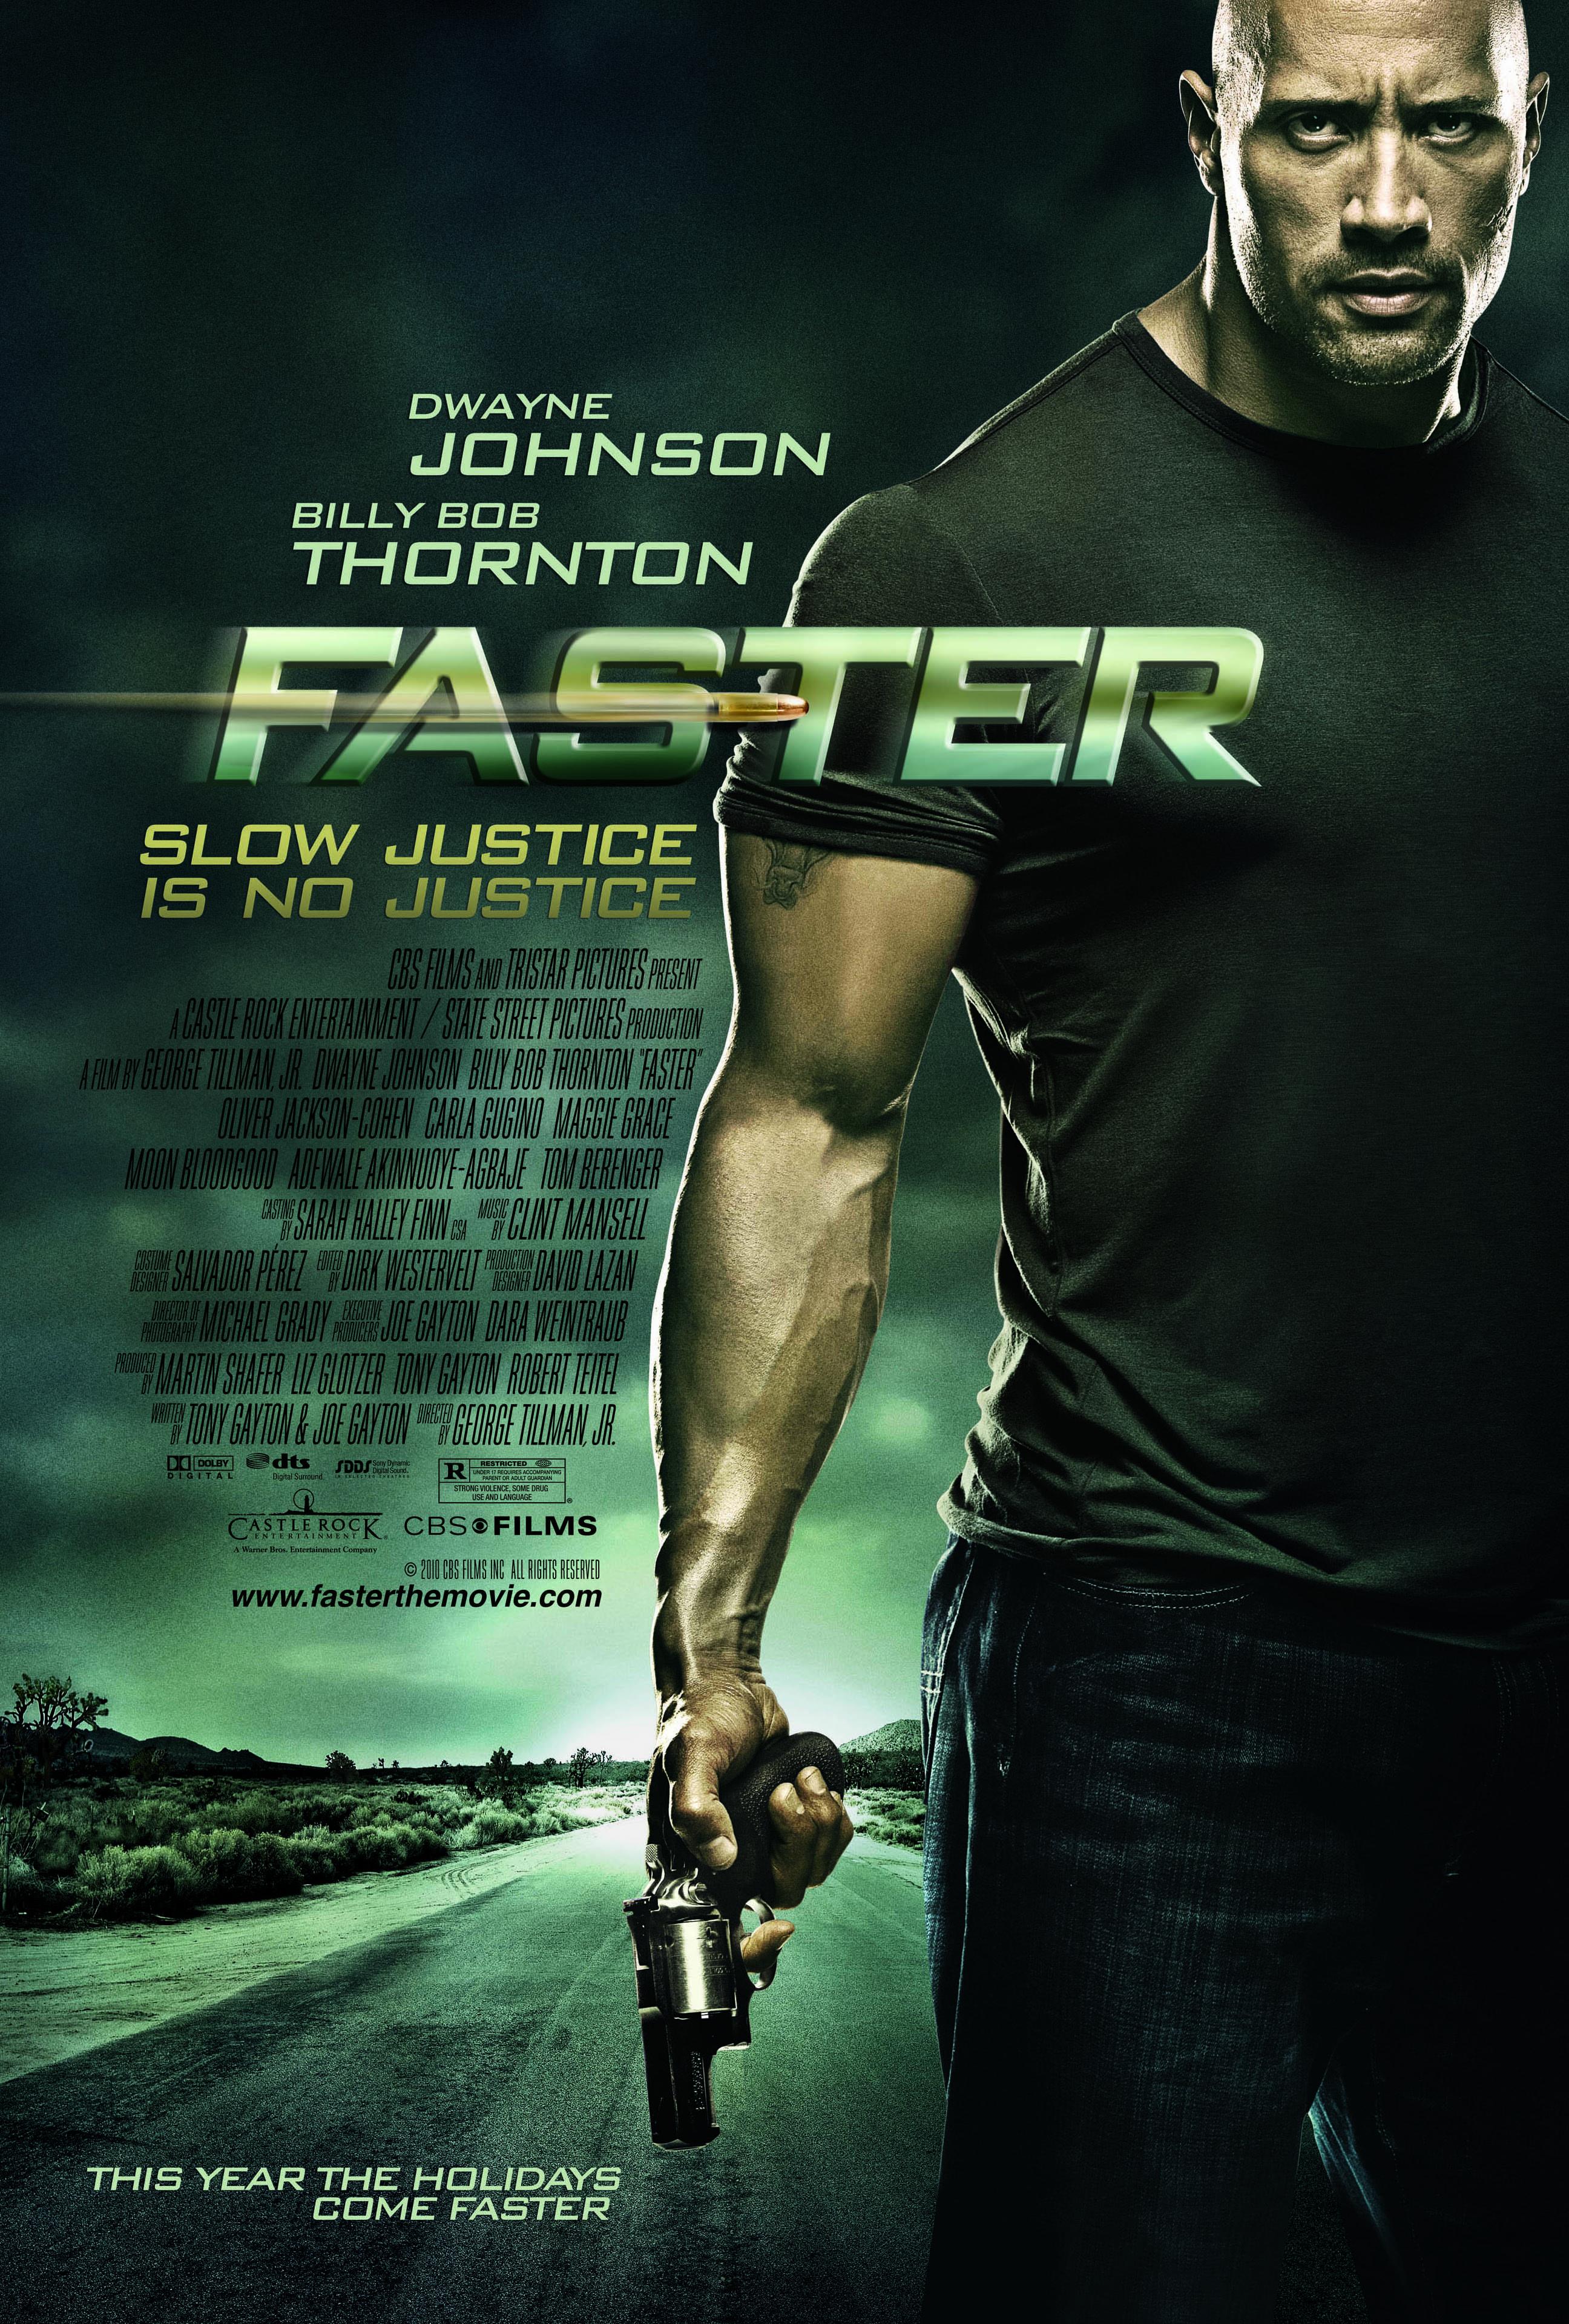 MARABOUT DES FILMS DE CINEMA  - Page 39 Faster_poster_02_dwayne_johnson